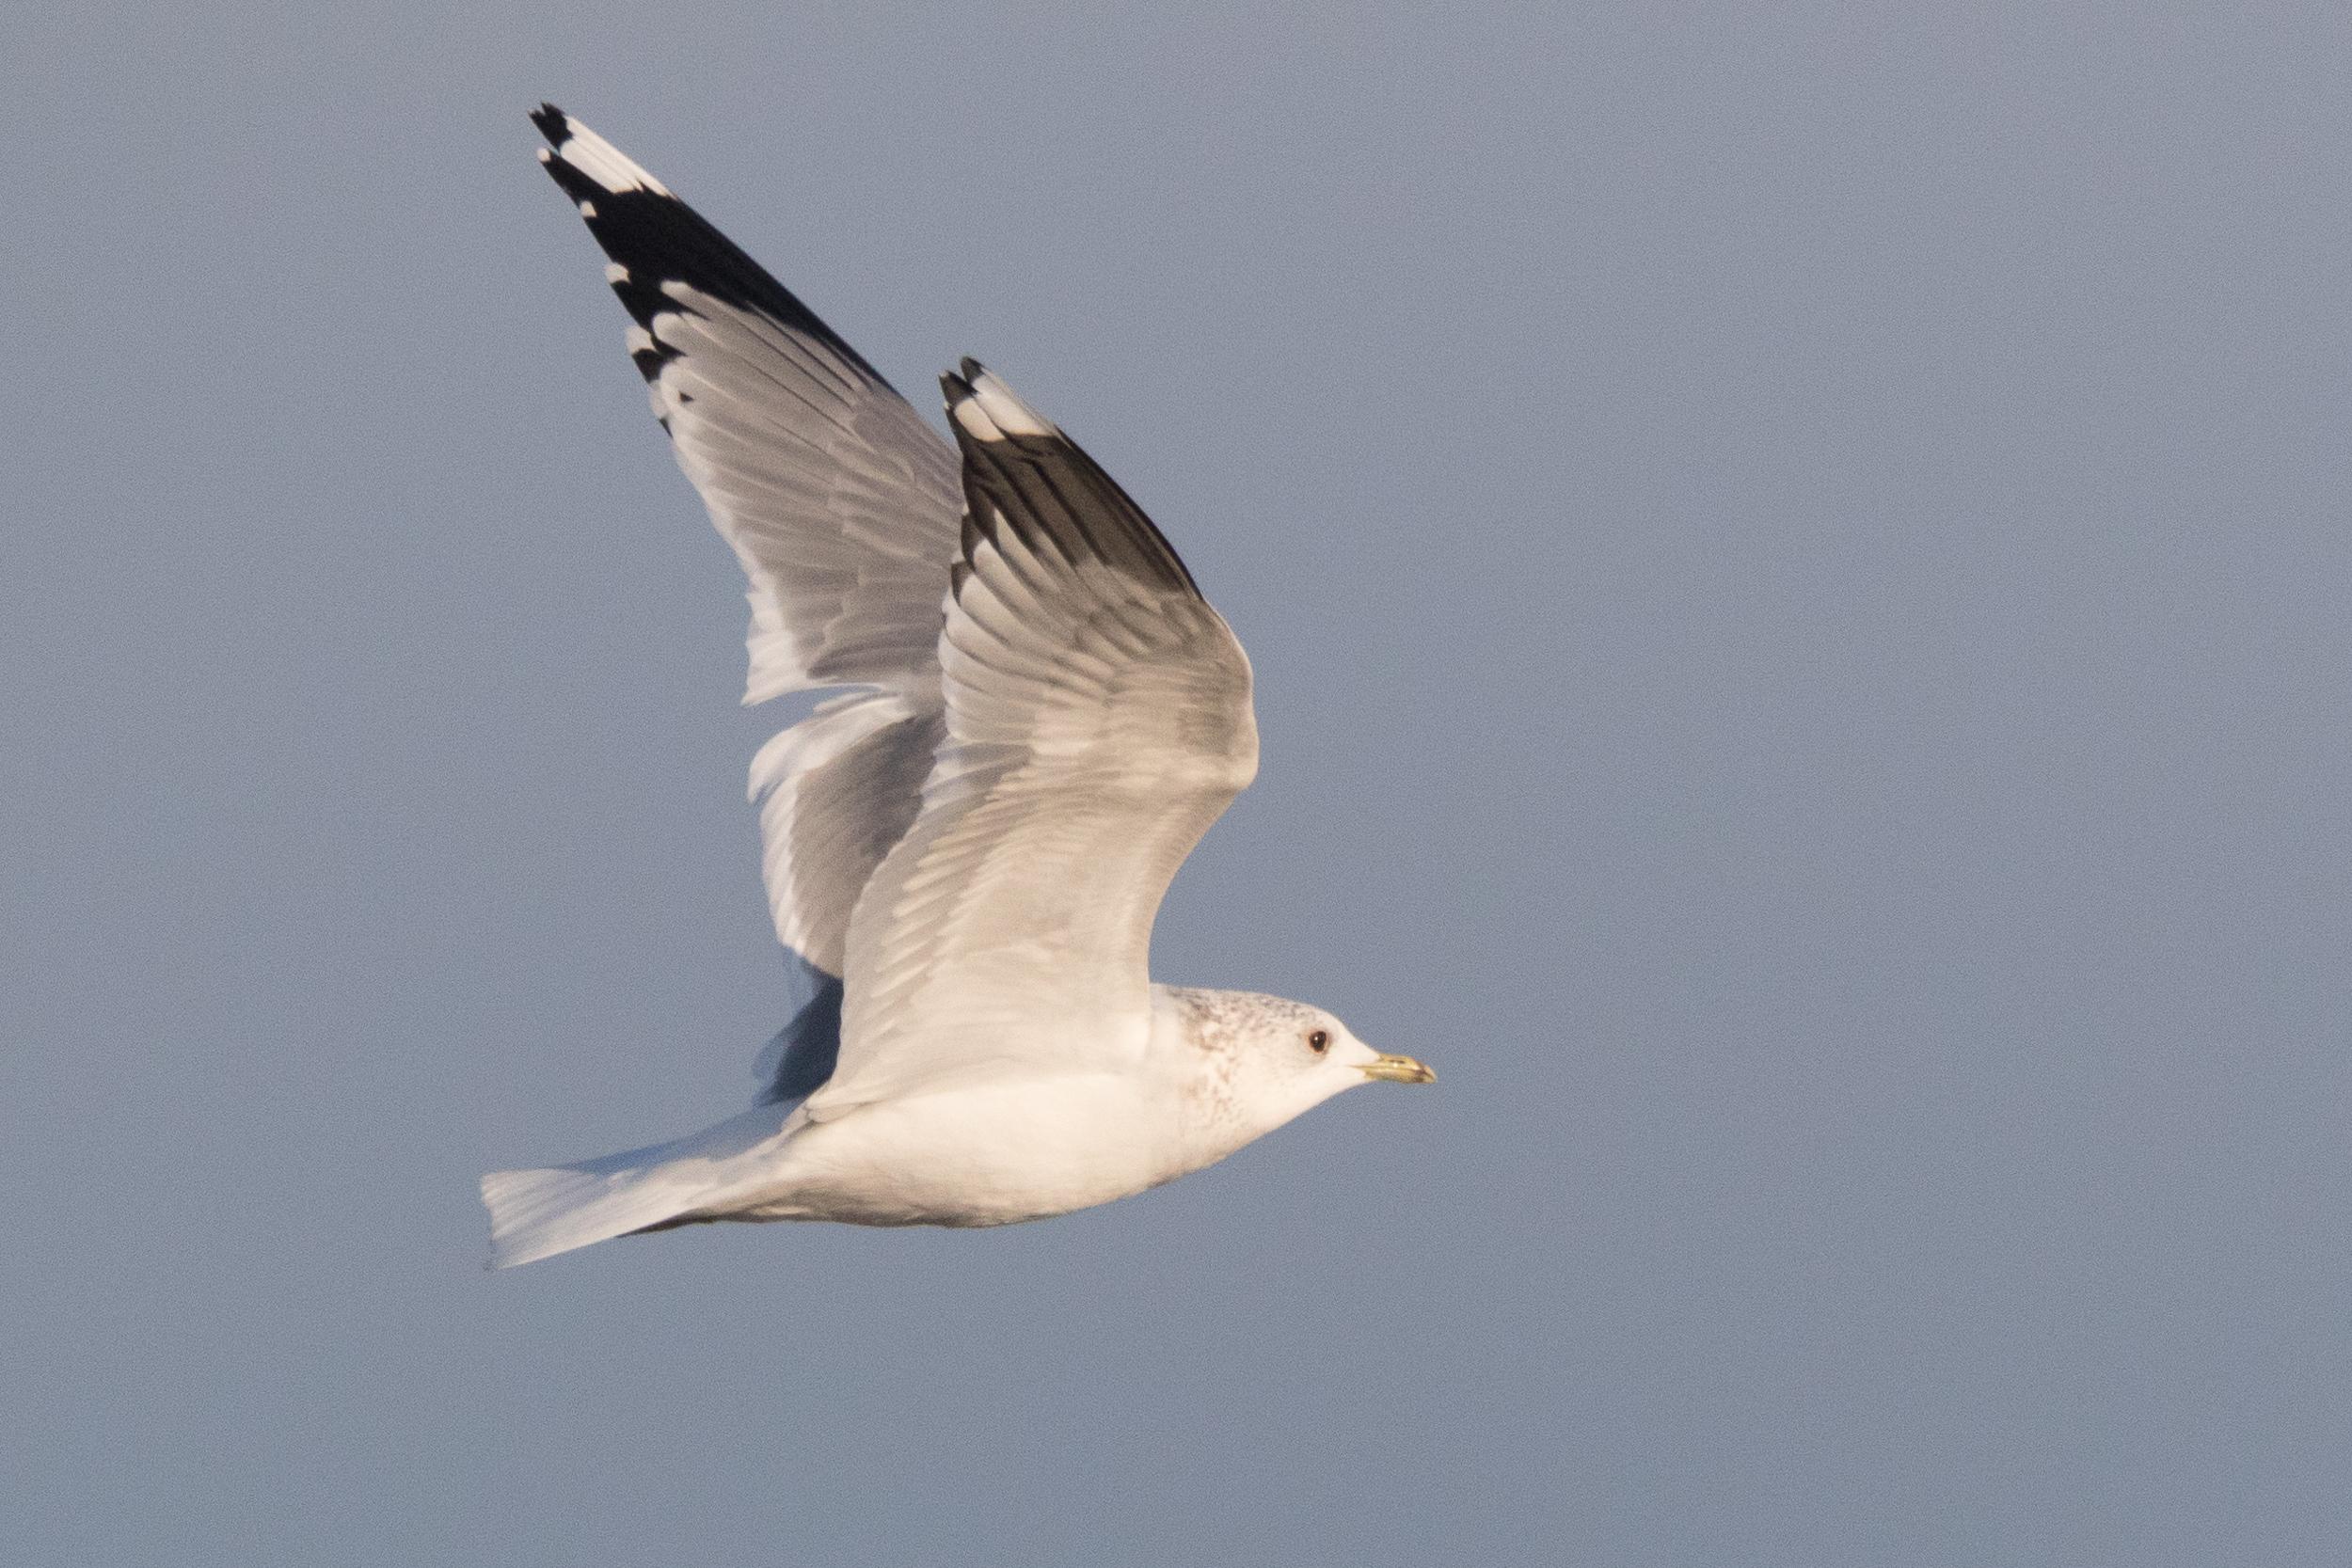 20170121-Common Gull Adult-03.jpg